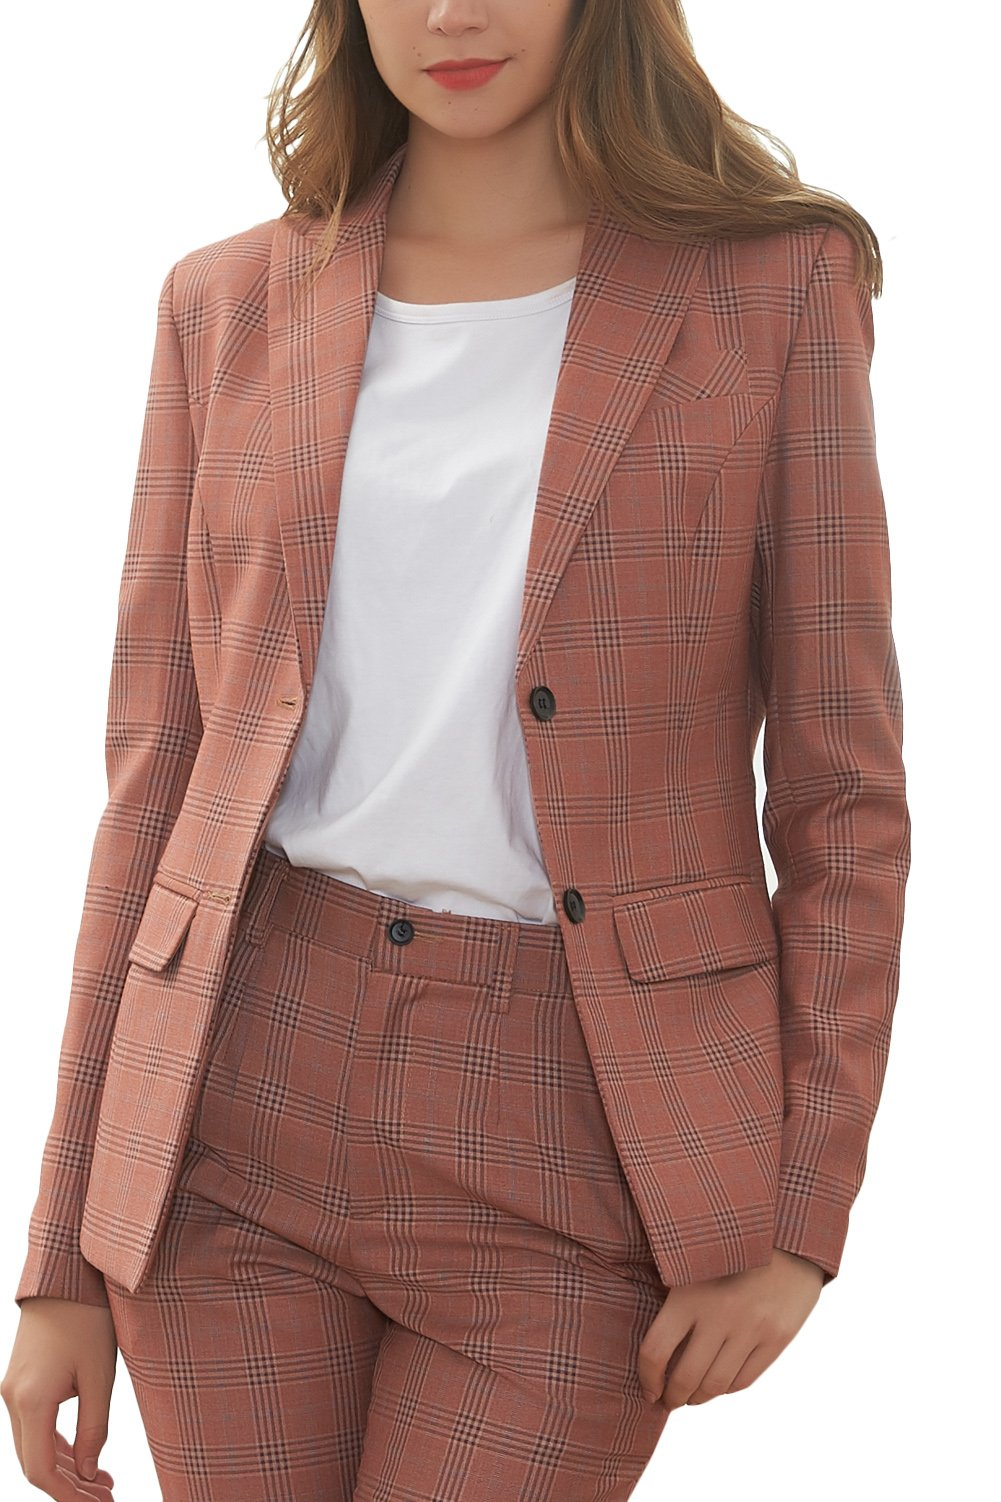 Hanayome Women's Suit Single Breasted Regular Fit Formal 2 PC Blazer Separate Pants MI1 (Cerise, 16W)